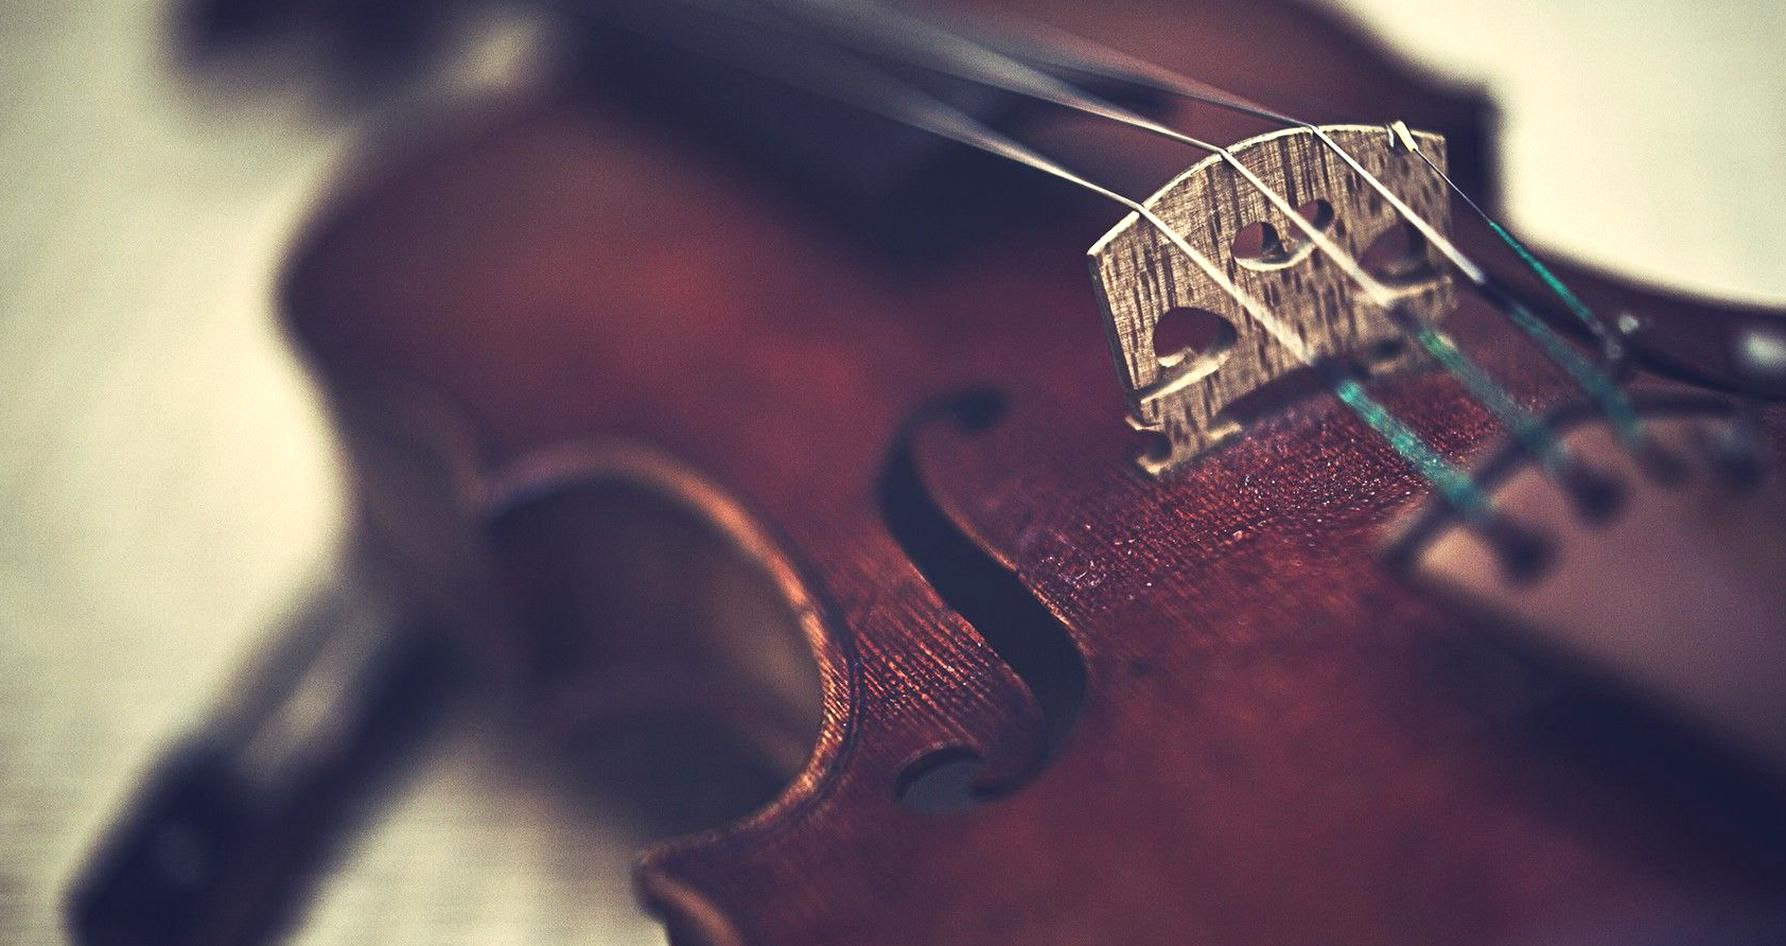 Anime Violin Wallpaper Hd Custom Hd Violin Wallpapers And Pictures 1920x1080 125 Violin Hd Wallpapers Background Images In 2020 Violin Violin Music Music Instruments